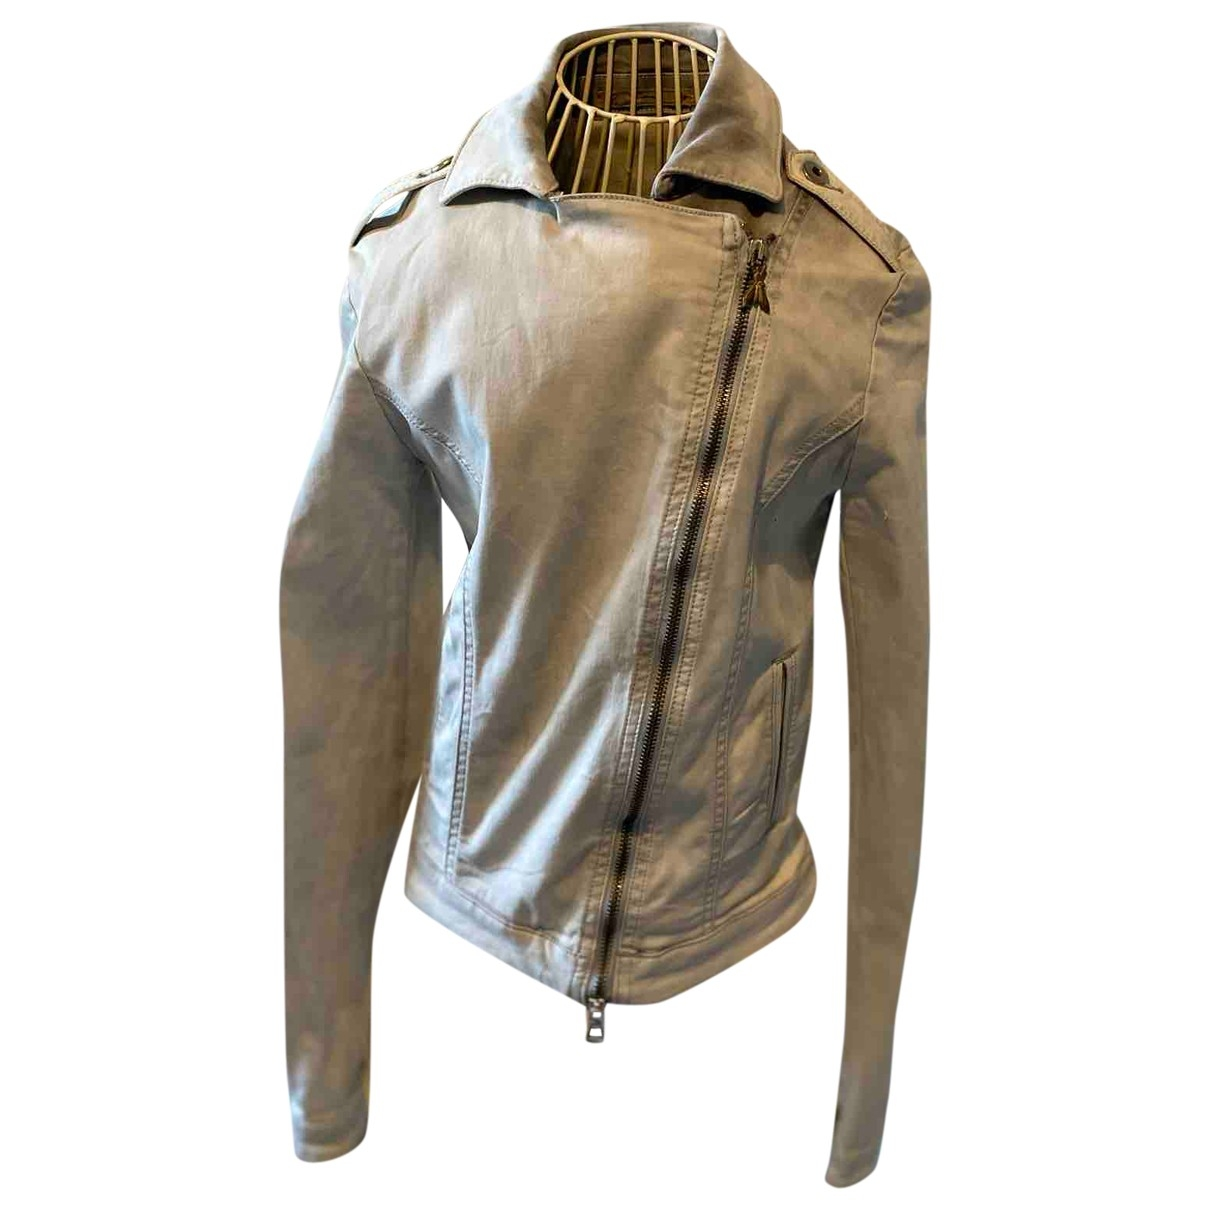 Patrizia Pepe \N Denim - Jeans jacket for Women 42 IT